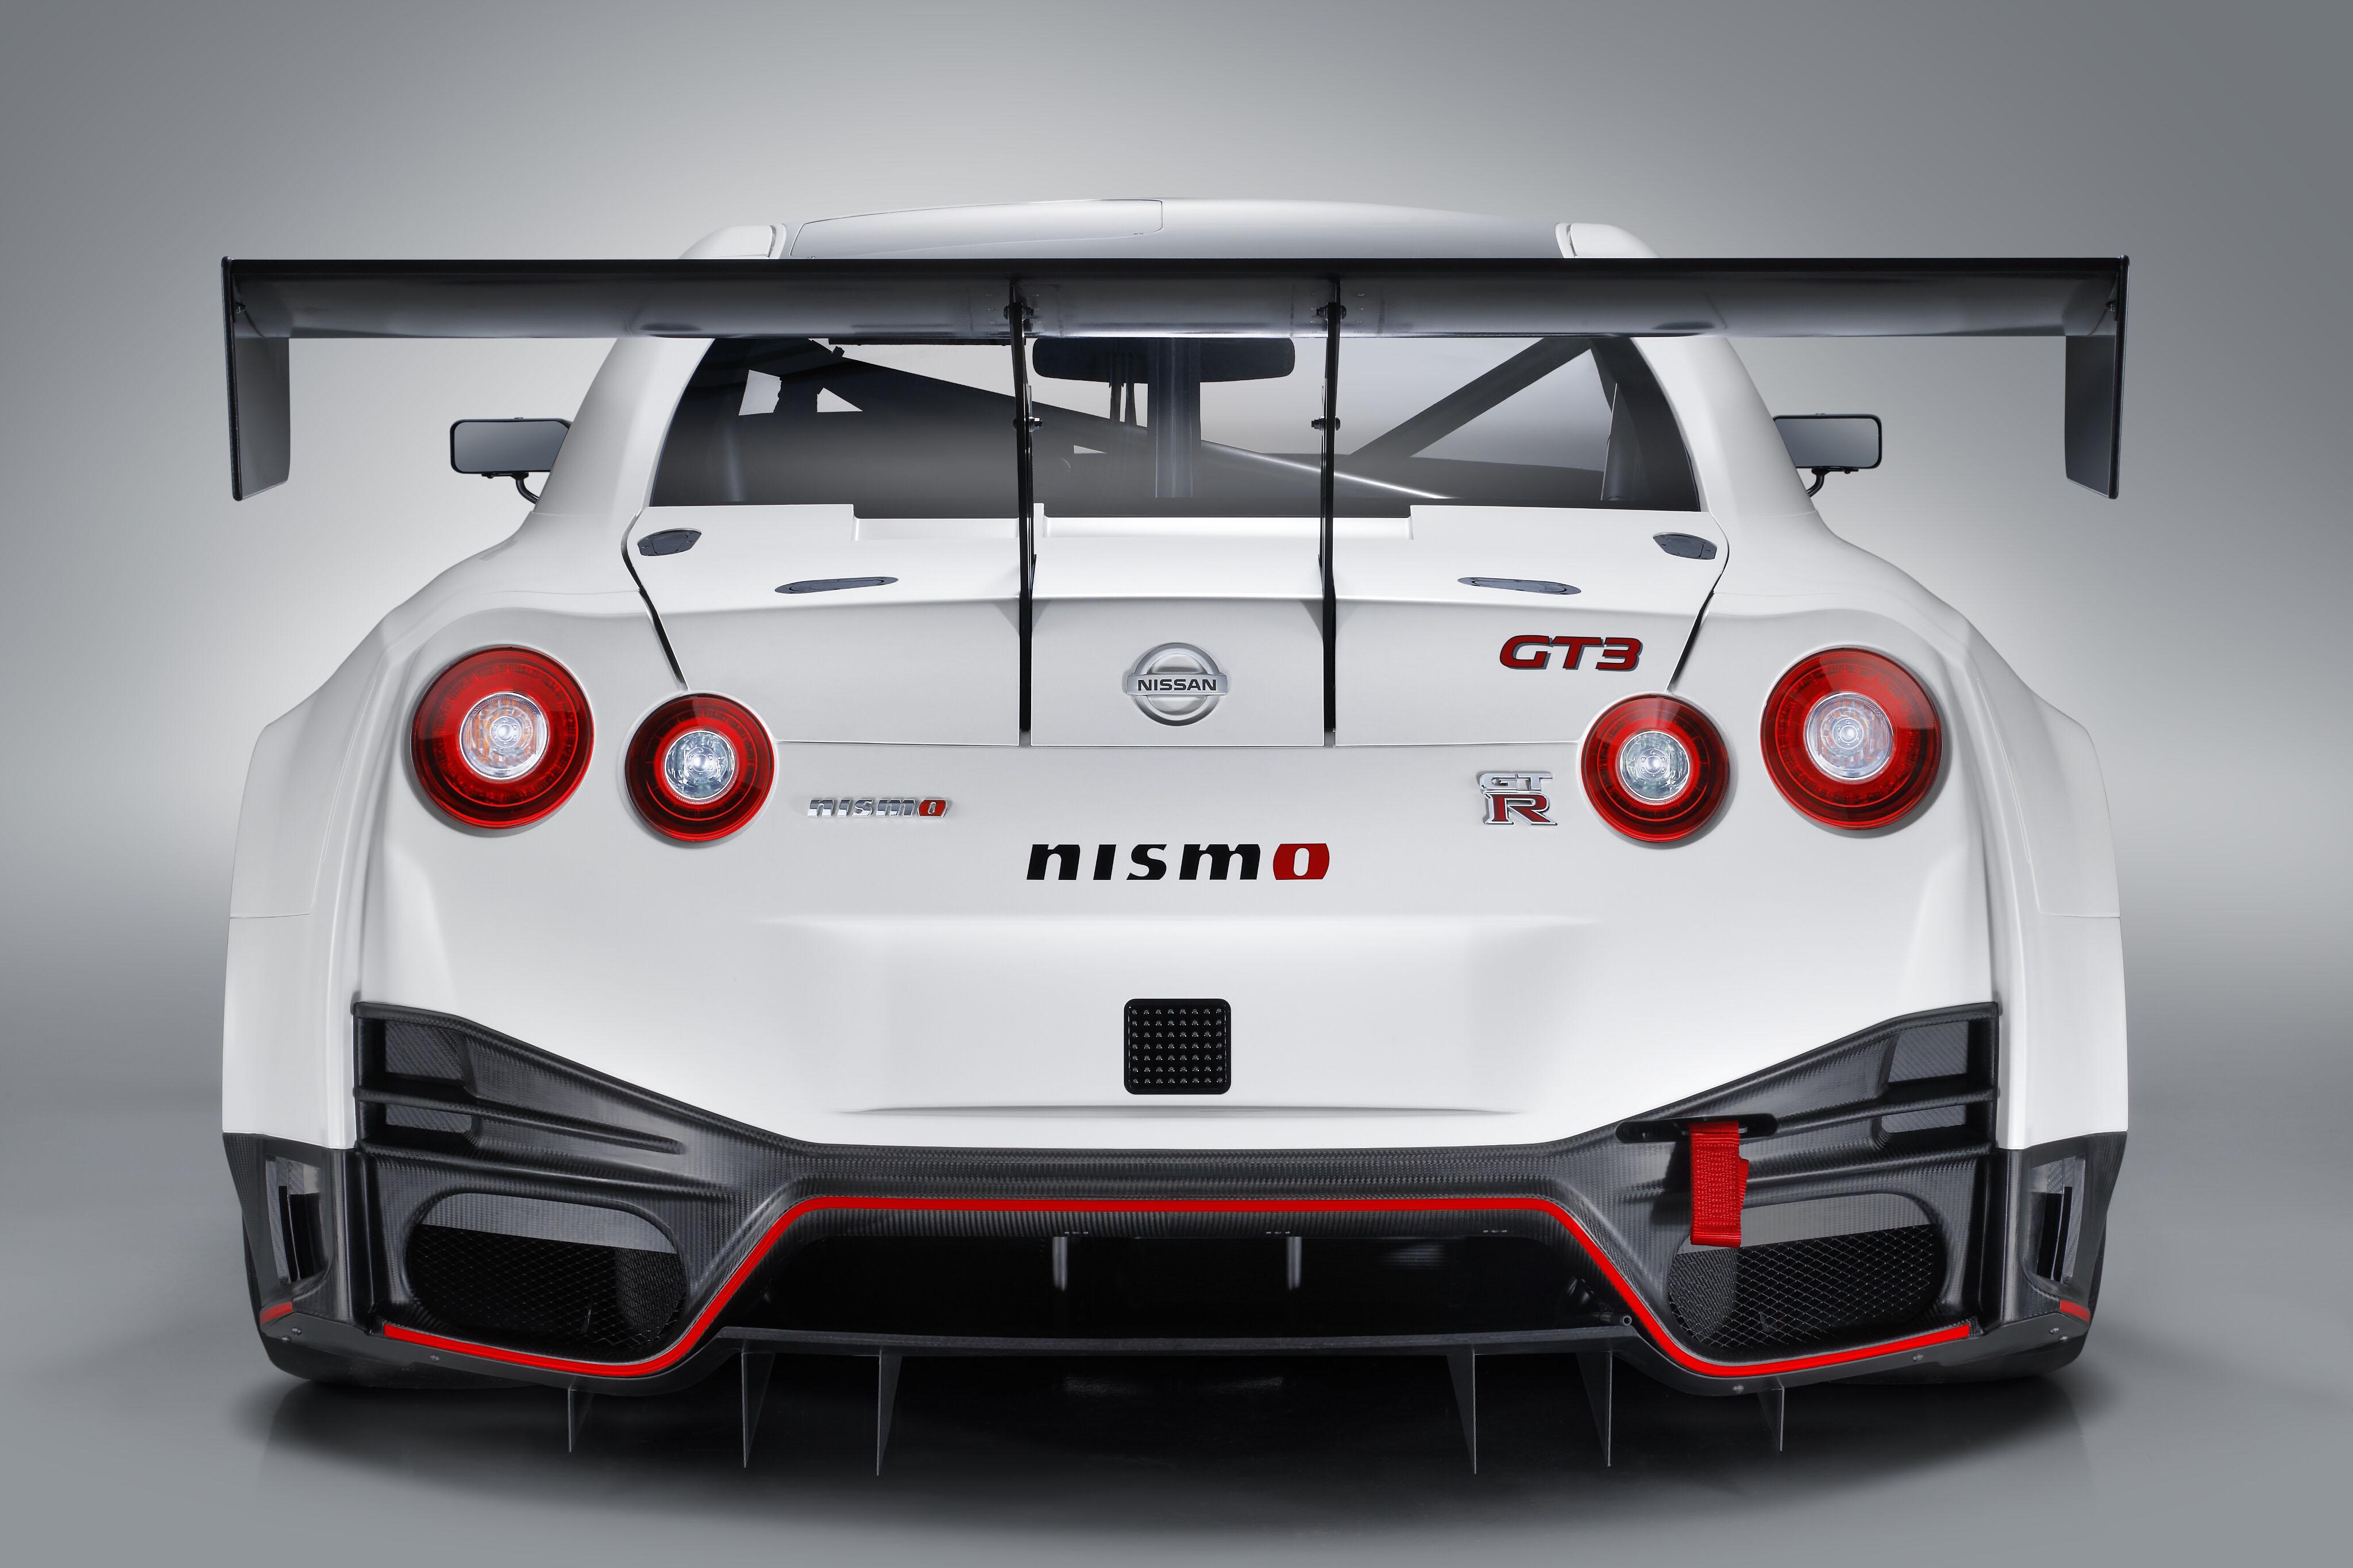 nismo nissan gt r gt3 2018 rear 4k 1548527999 - Nismo Nissan GT R GT3 2018 Rear 4k - nissan wallpapers, nissan gtr wallpapers, hd-wallpapers, cars wallpapers, 4k-wallpapers, 2018 cars wallpapers